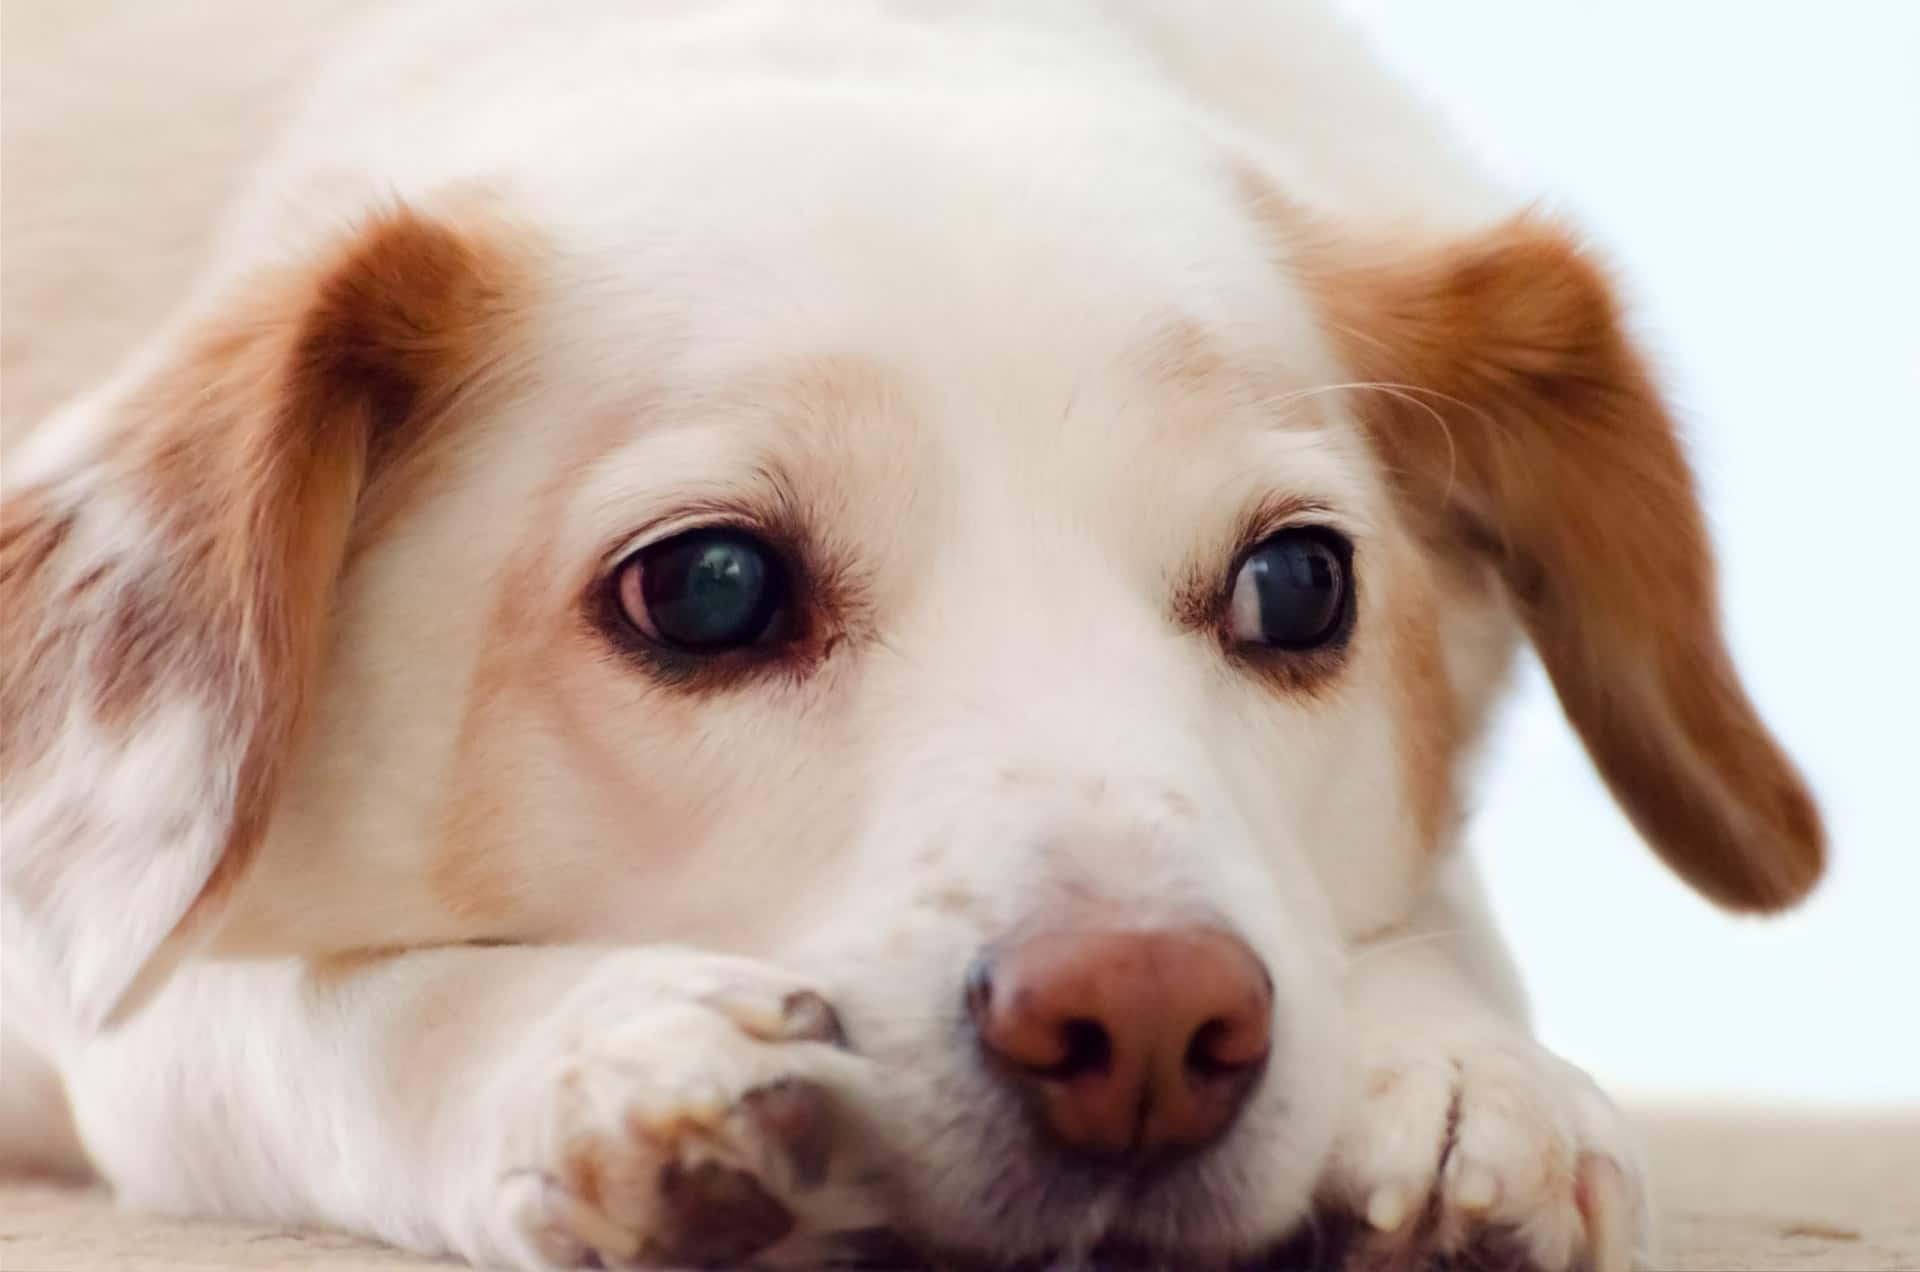 Dale cariño a tu perro si está triste